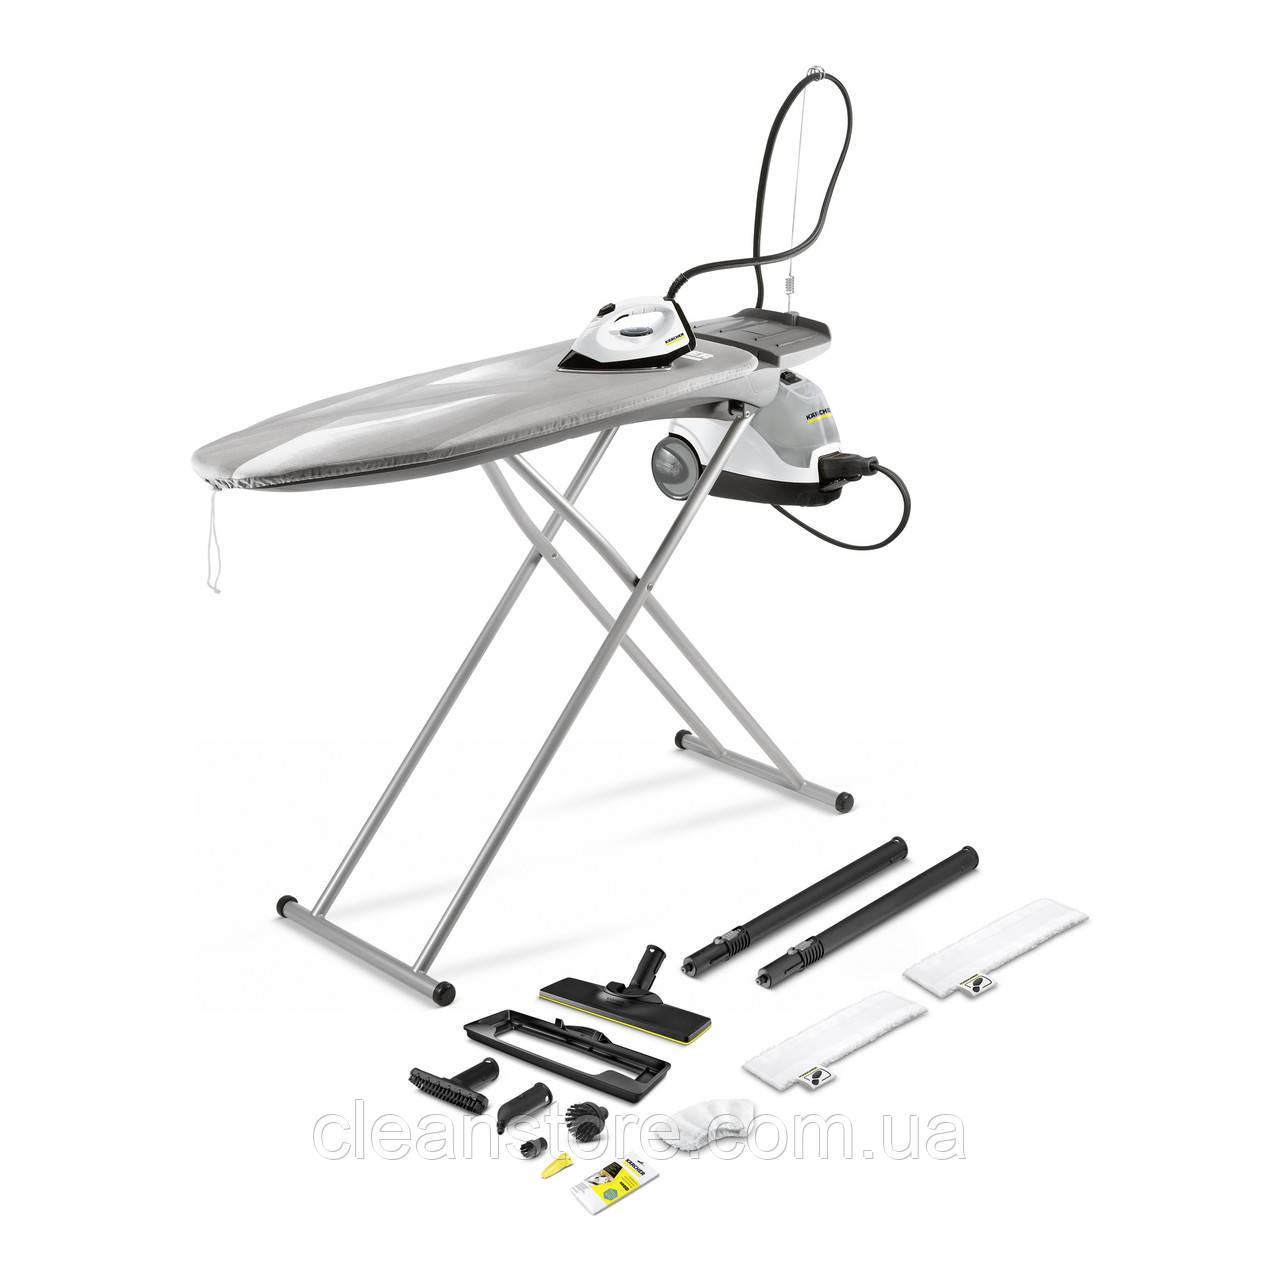 Паровая гладильная станция SI 4 EasyFix Premium Iron